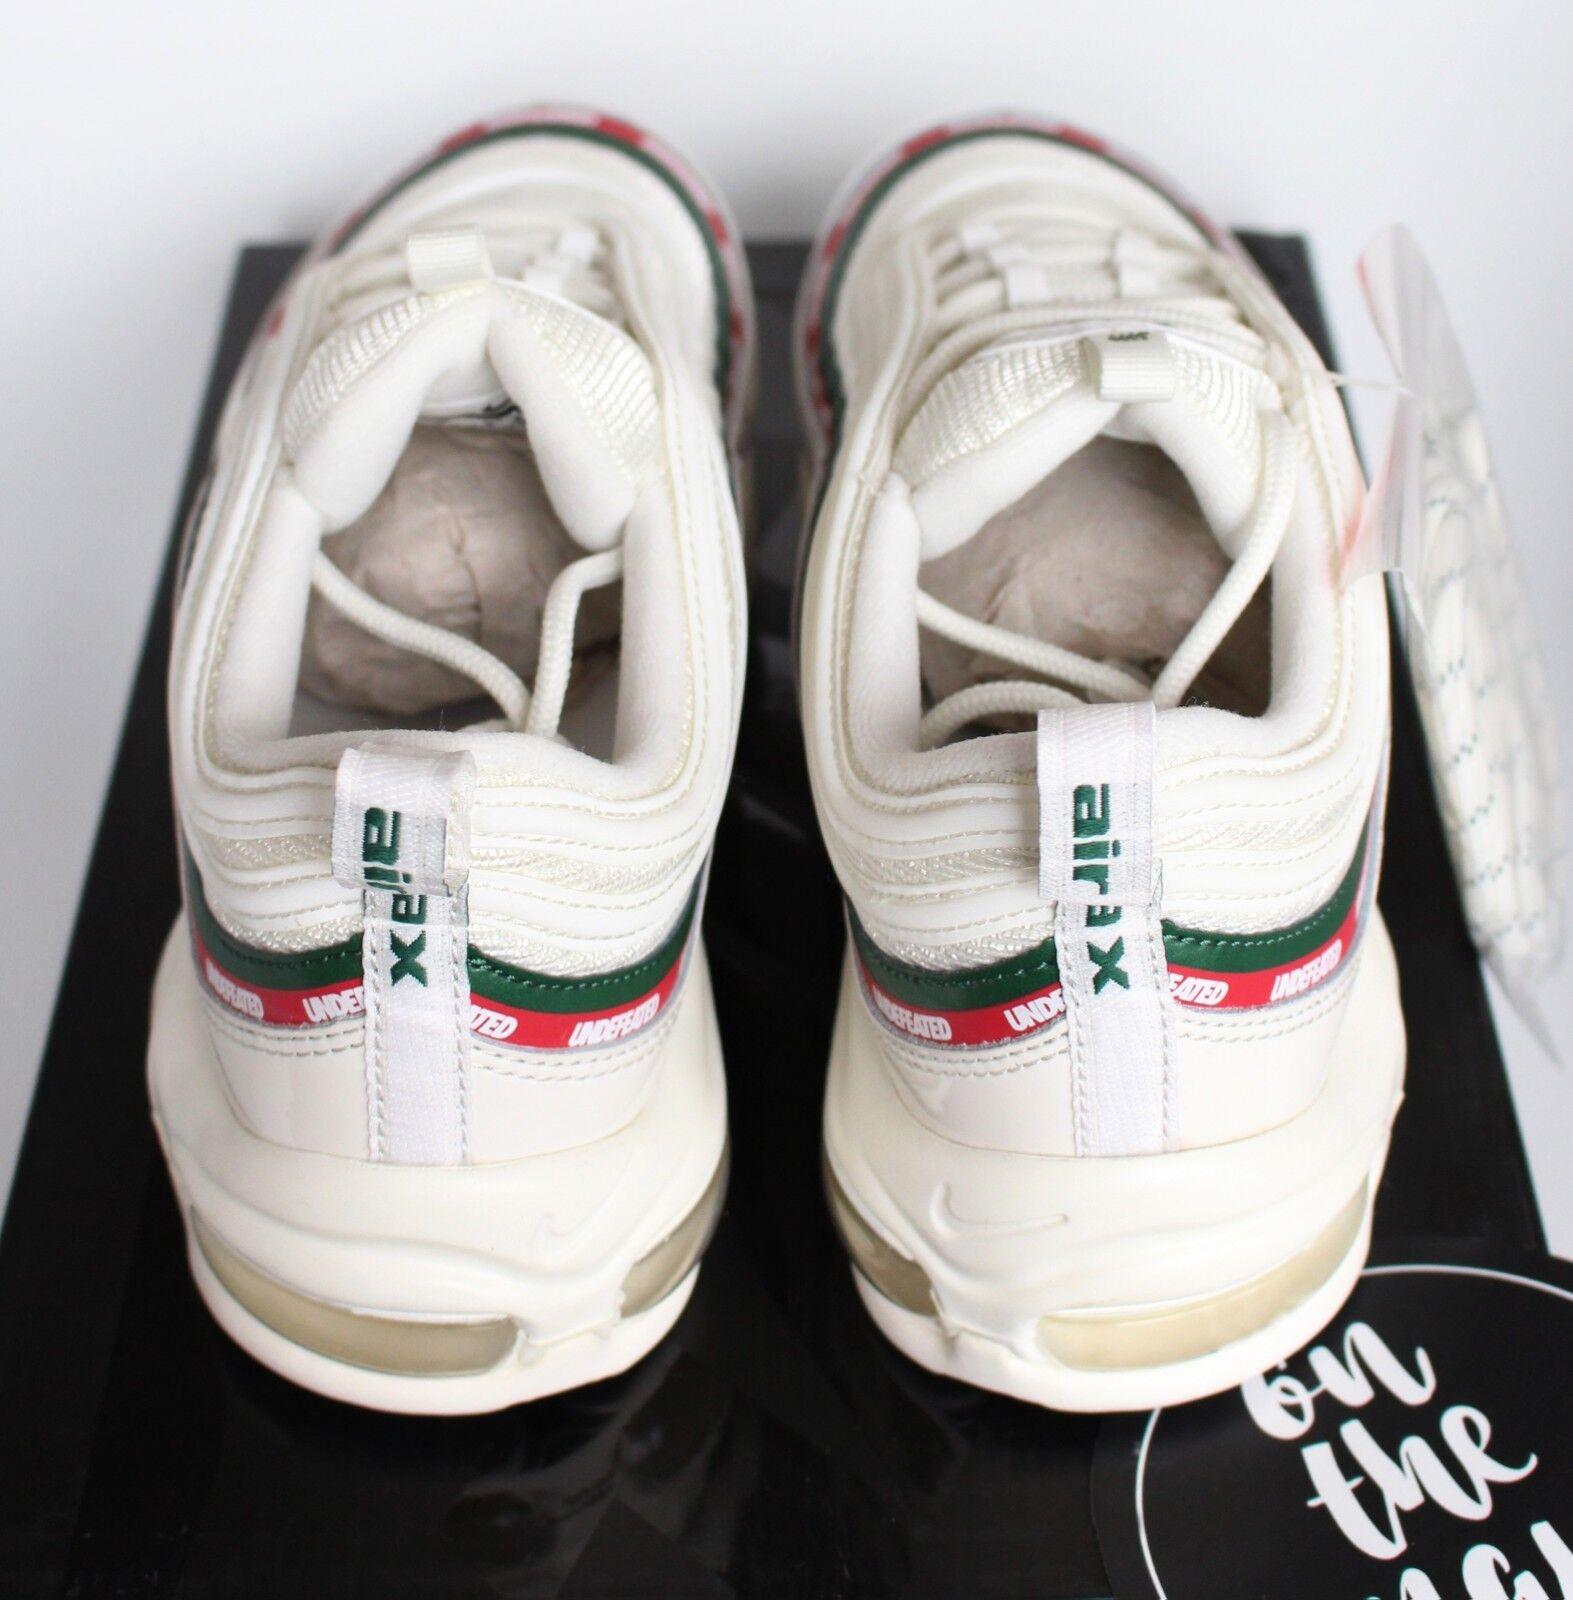 Nike Undefeated Max 97 og X Blanco Crema Air 9.5 Rojo UNDFTD AJ1986-100 Reino Unido 8.5 9.5 Air Nuevo 7a9b8f